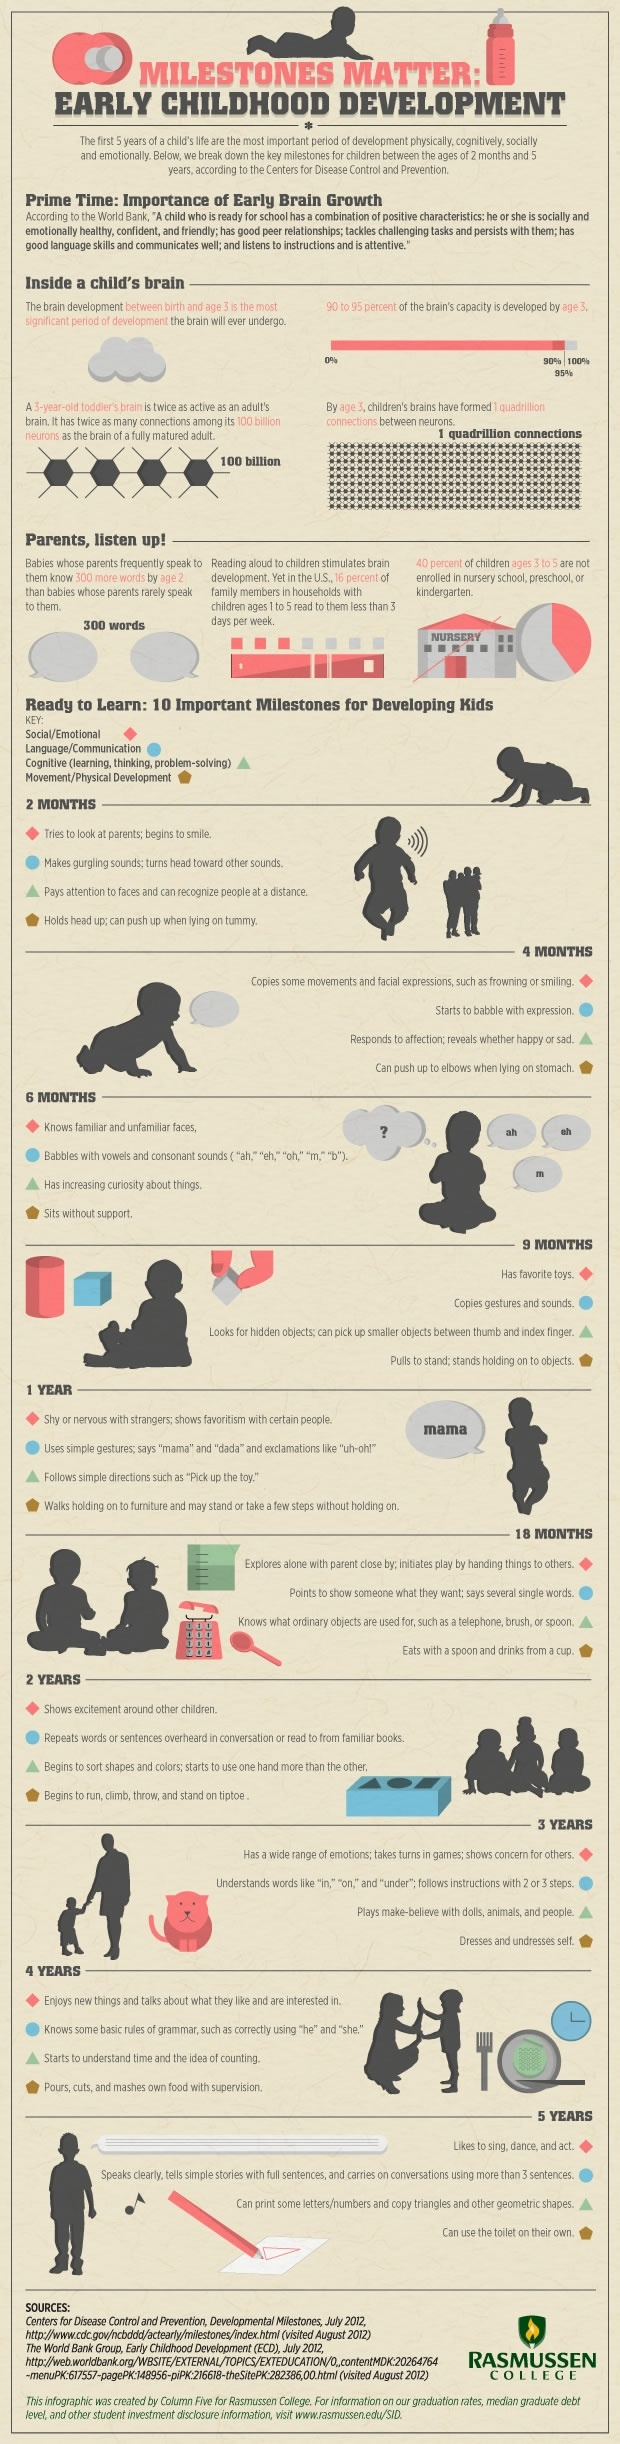 Childhood Developmental Milestones Infographic